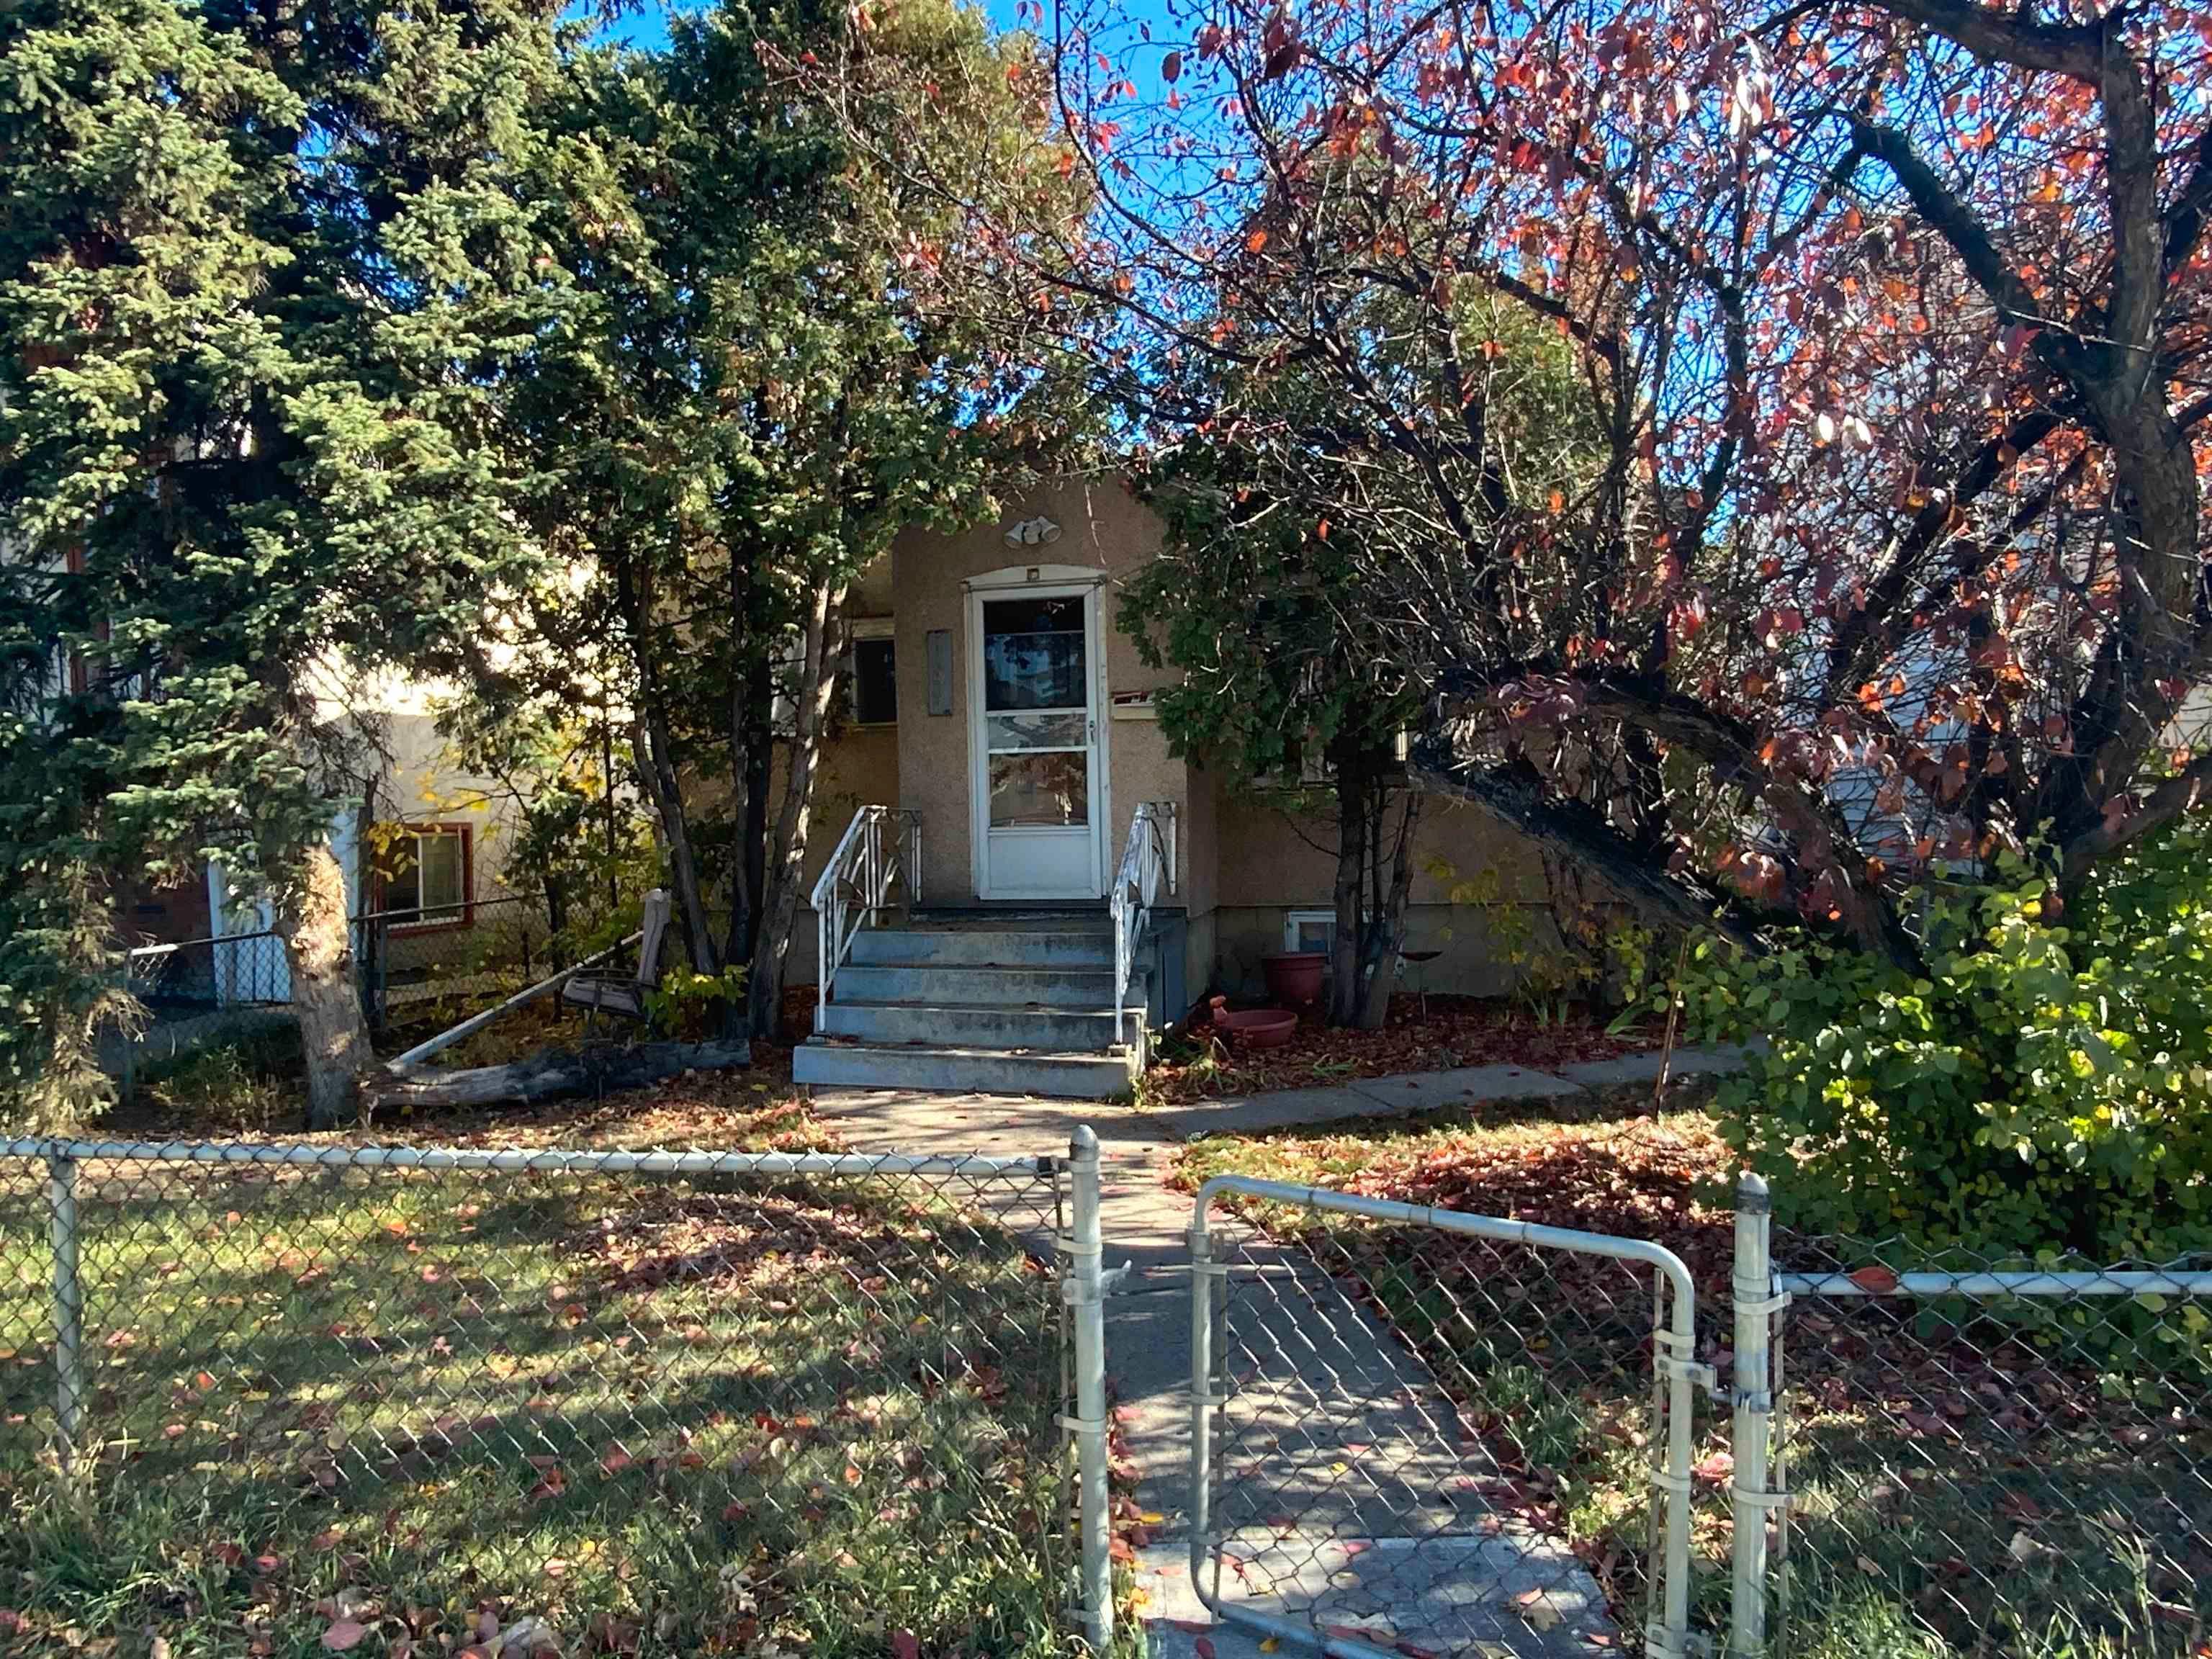 Main Photo: 11531 101 Street in Edmonton: Zone 08 House for sale : MLS®# E4266207